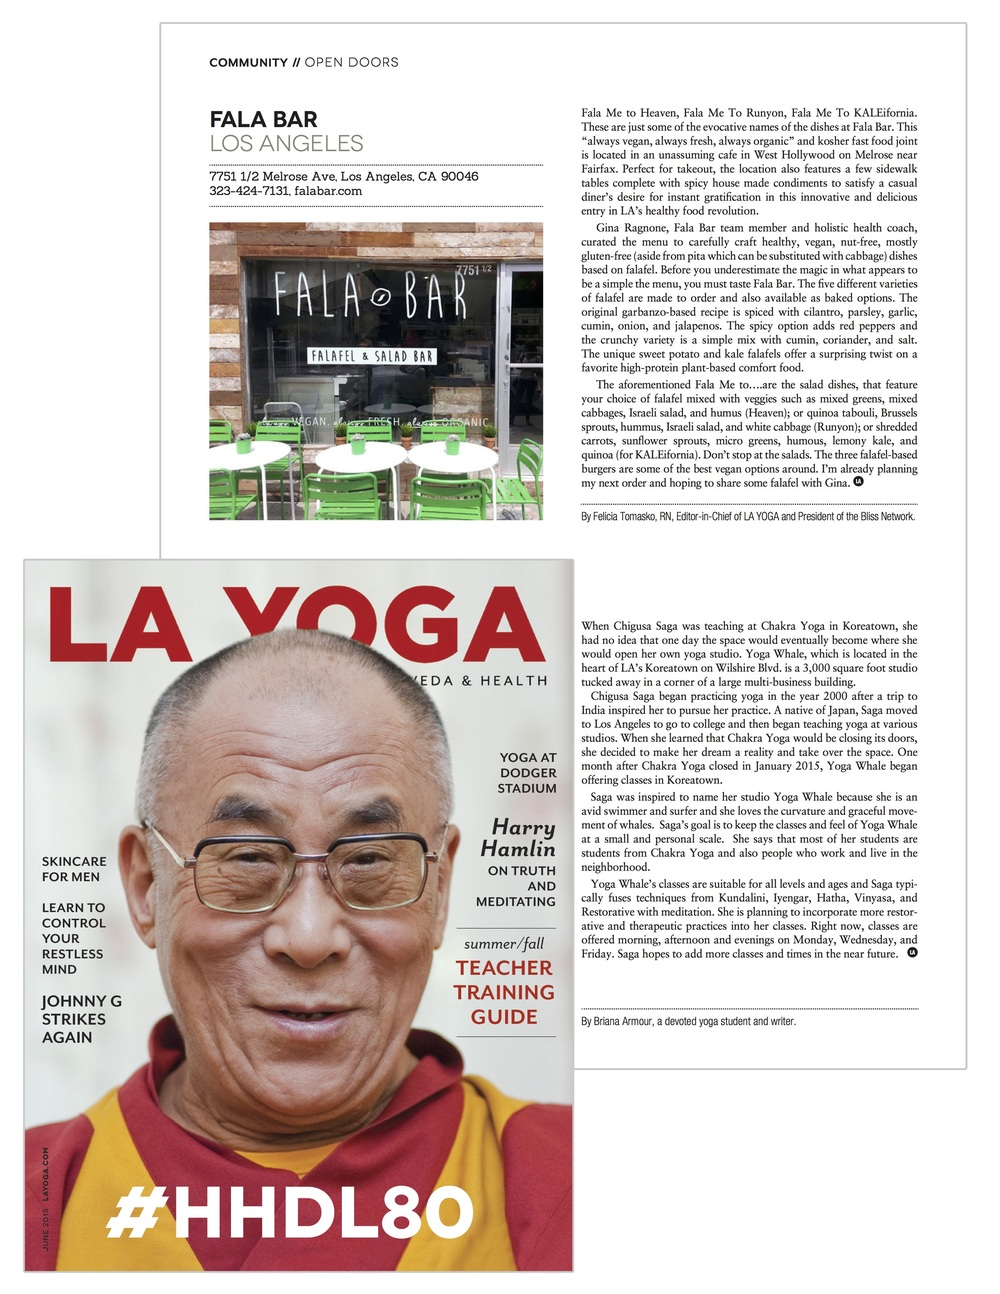 Report about Fala Bar / LA Yoga